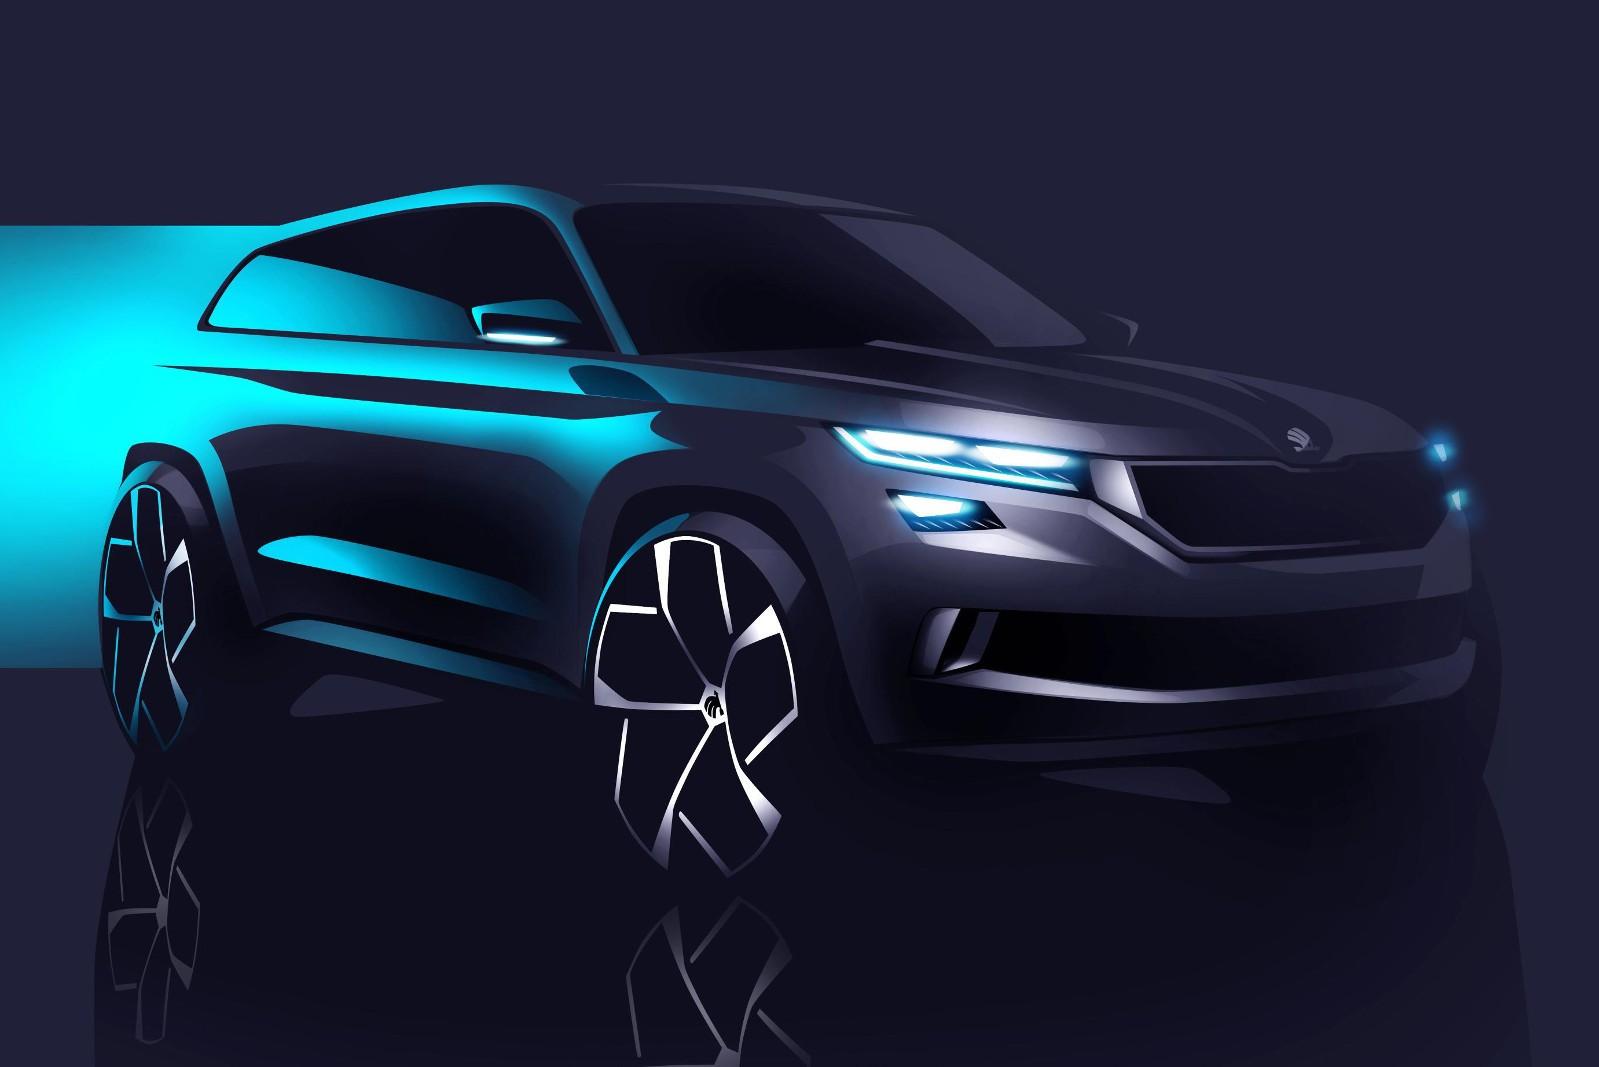 Skoda Visions Concept Previews 7 Seater Quot Kodiak Quot Suv At